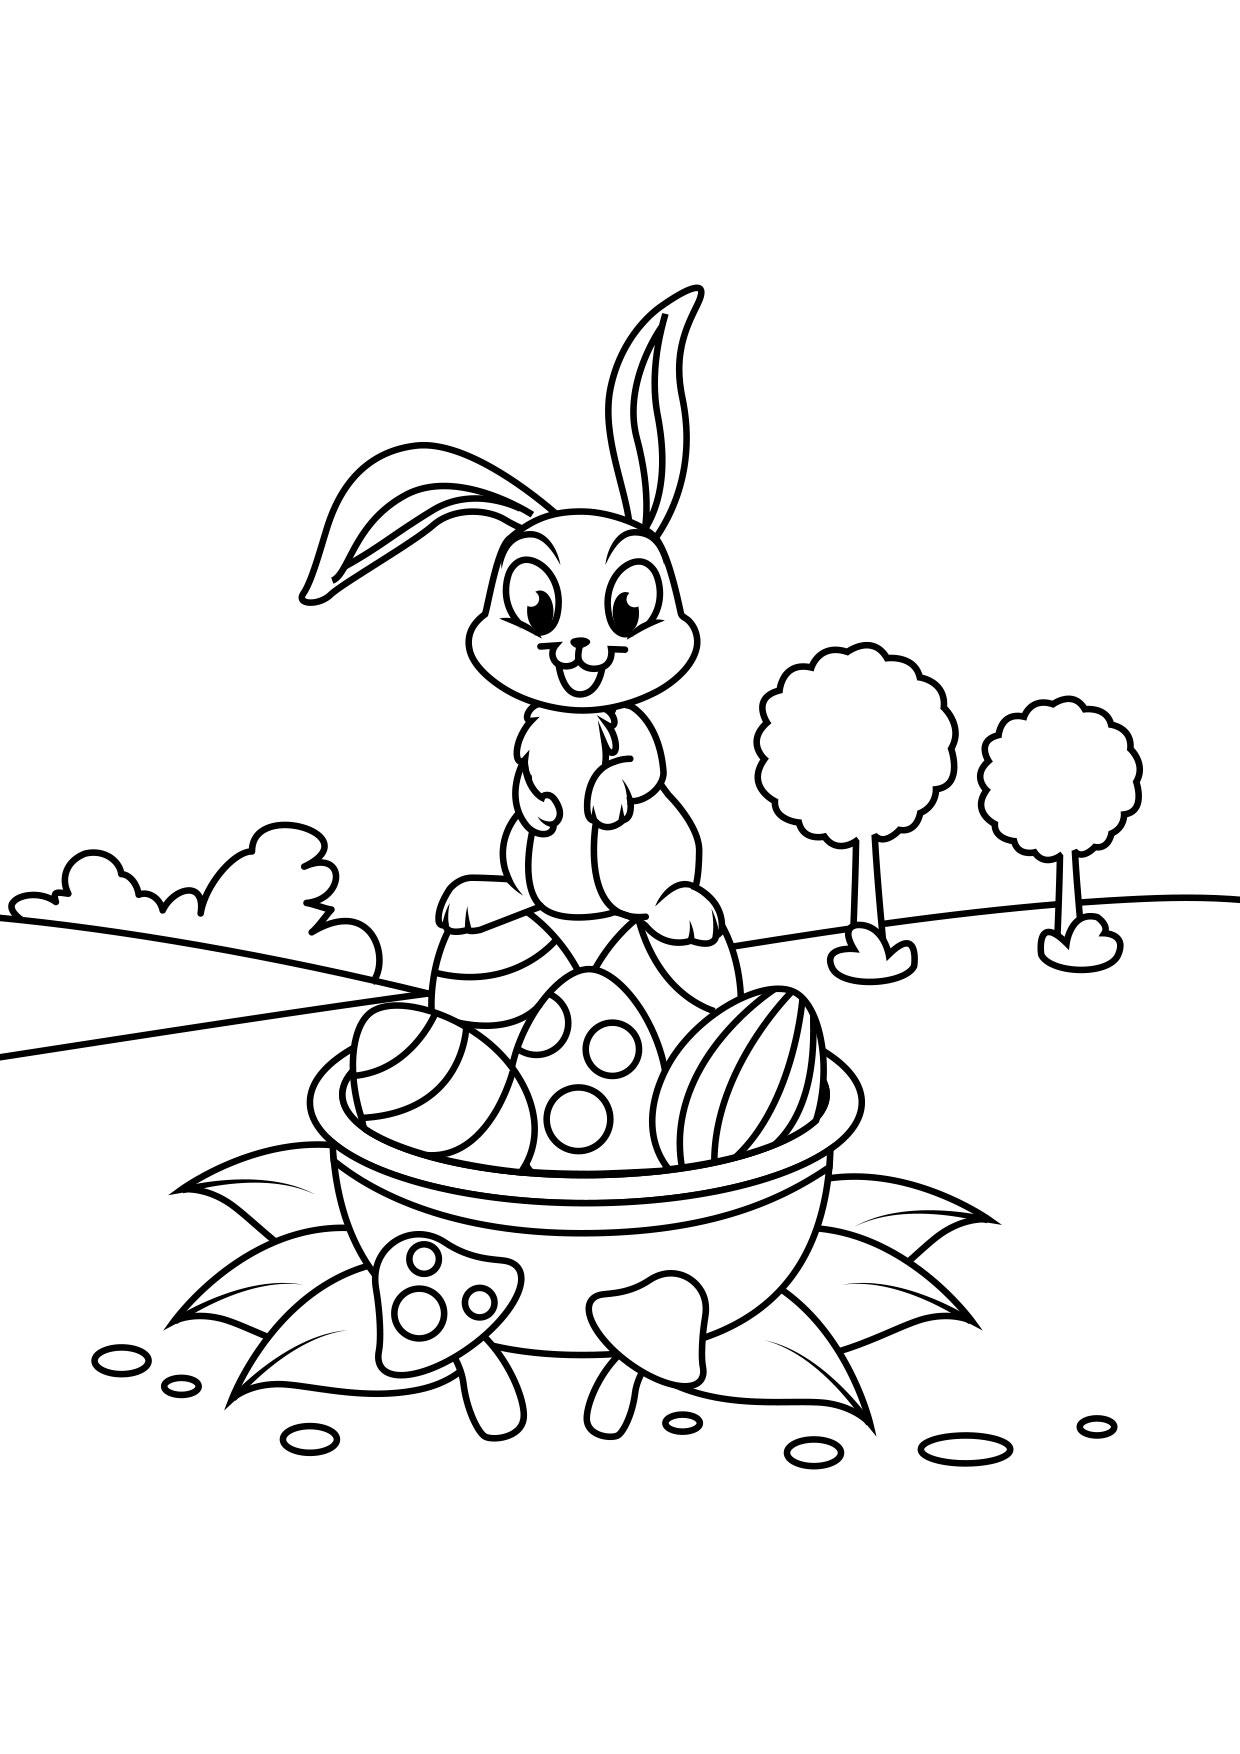 Dibujo Para Colorear Conejito De Pascua En Canasta De Pascua Dibujos Para Imprimir Gratis